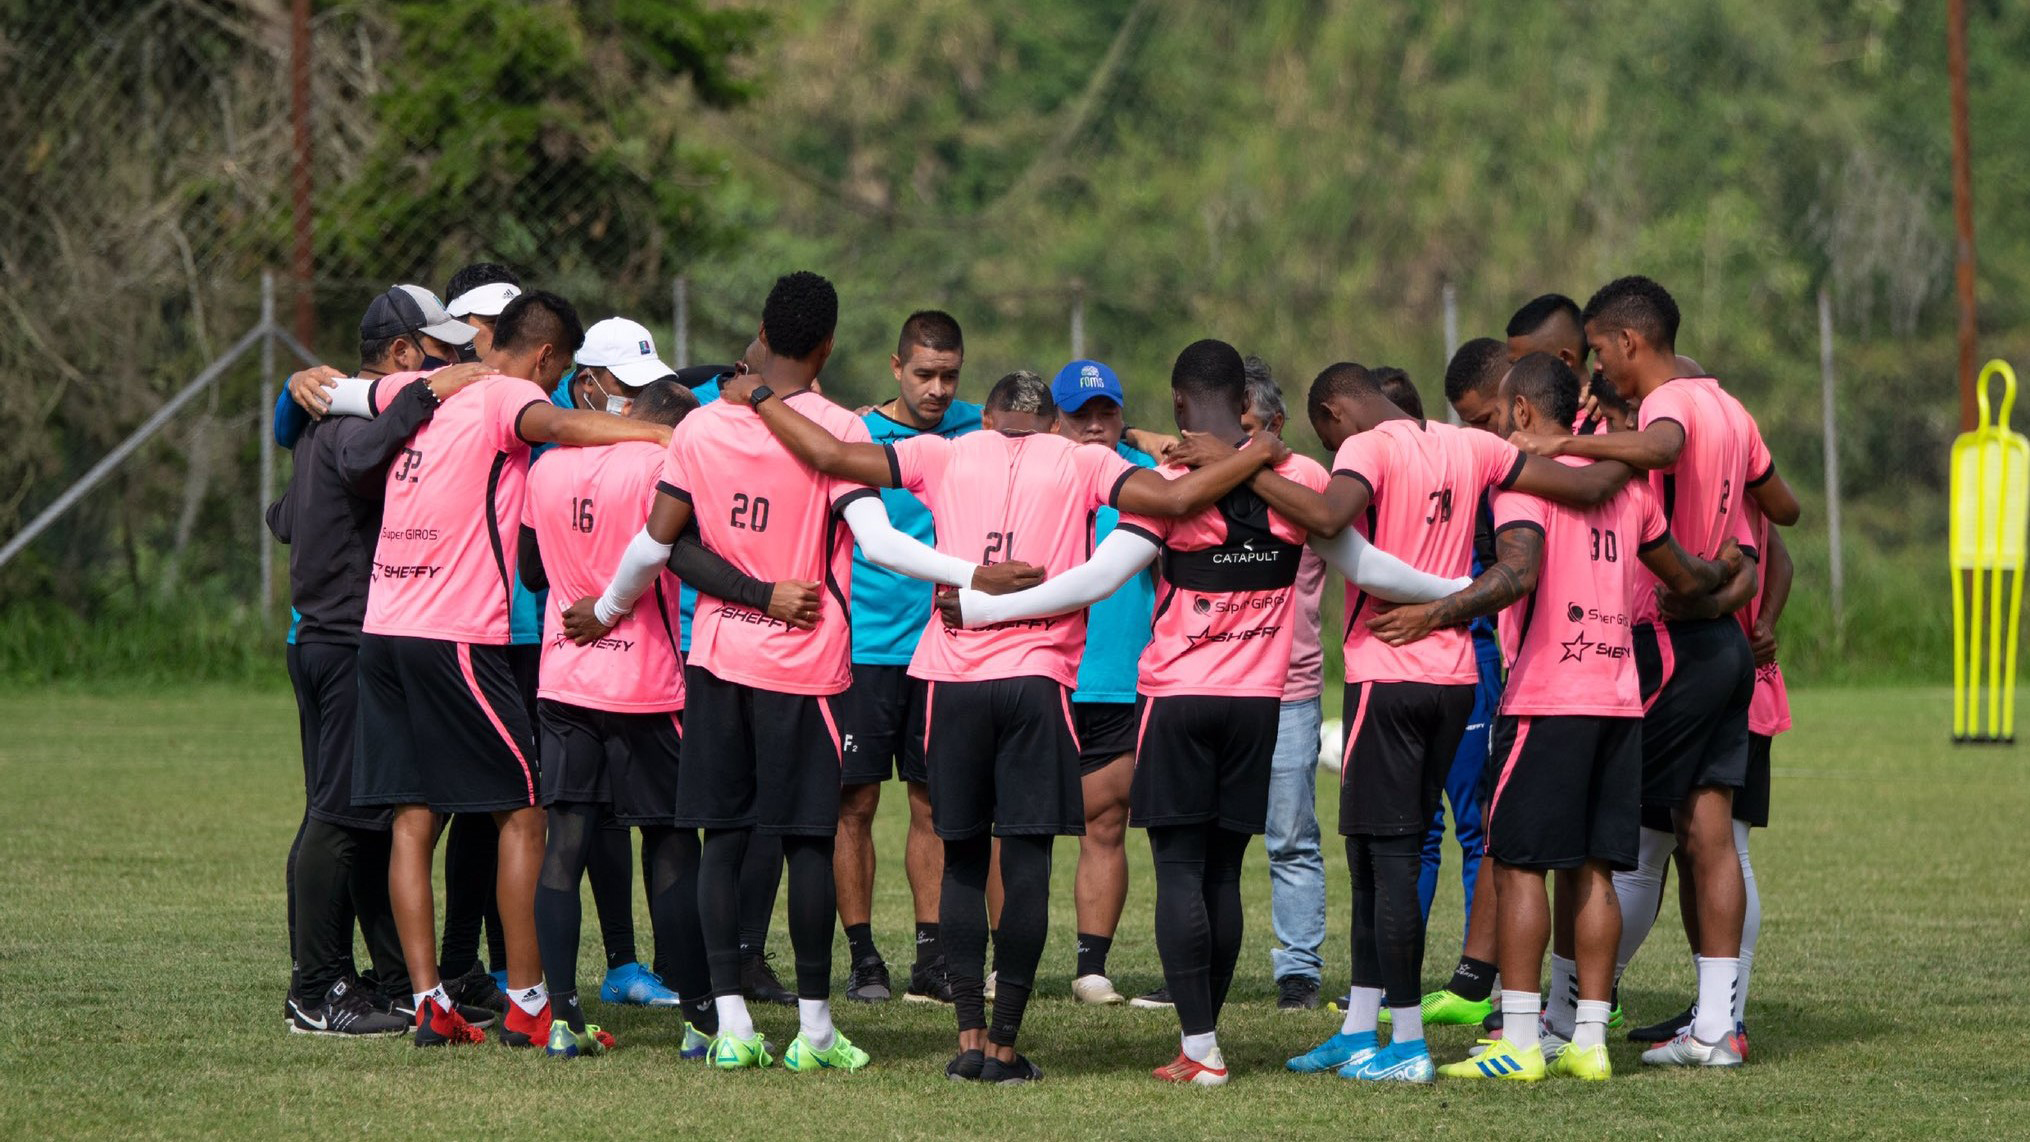 juan-guillermo-cuadrado-casa-blanca-oc-juventus-champions-league